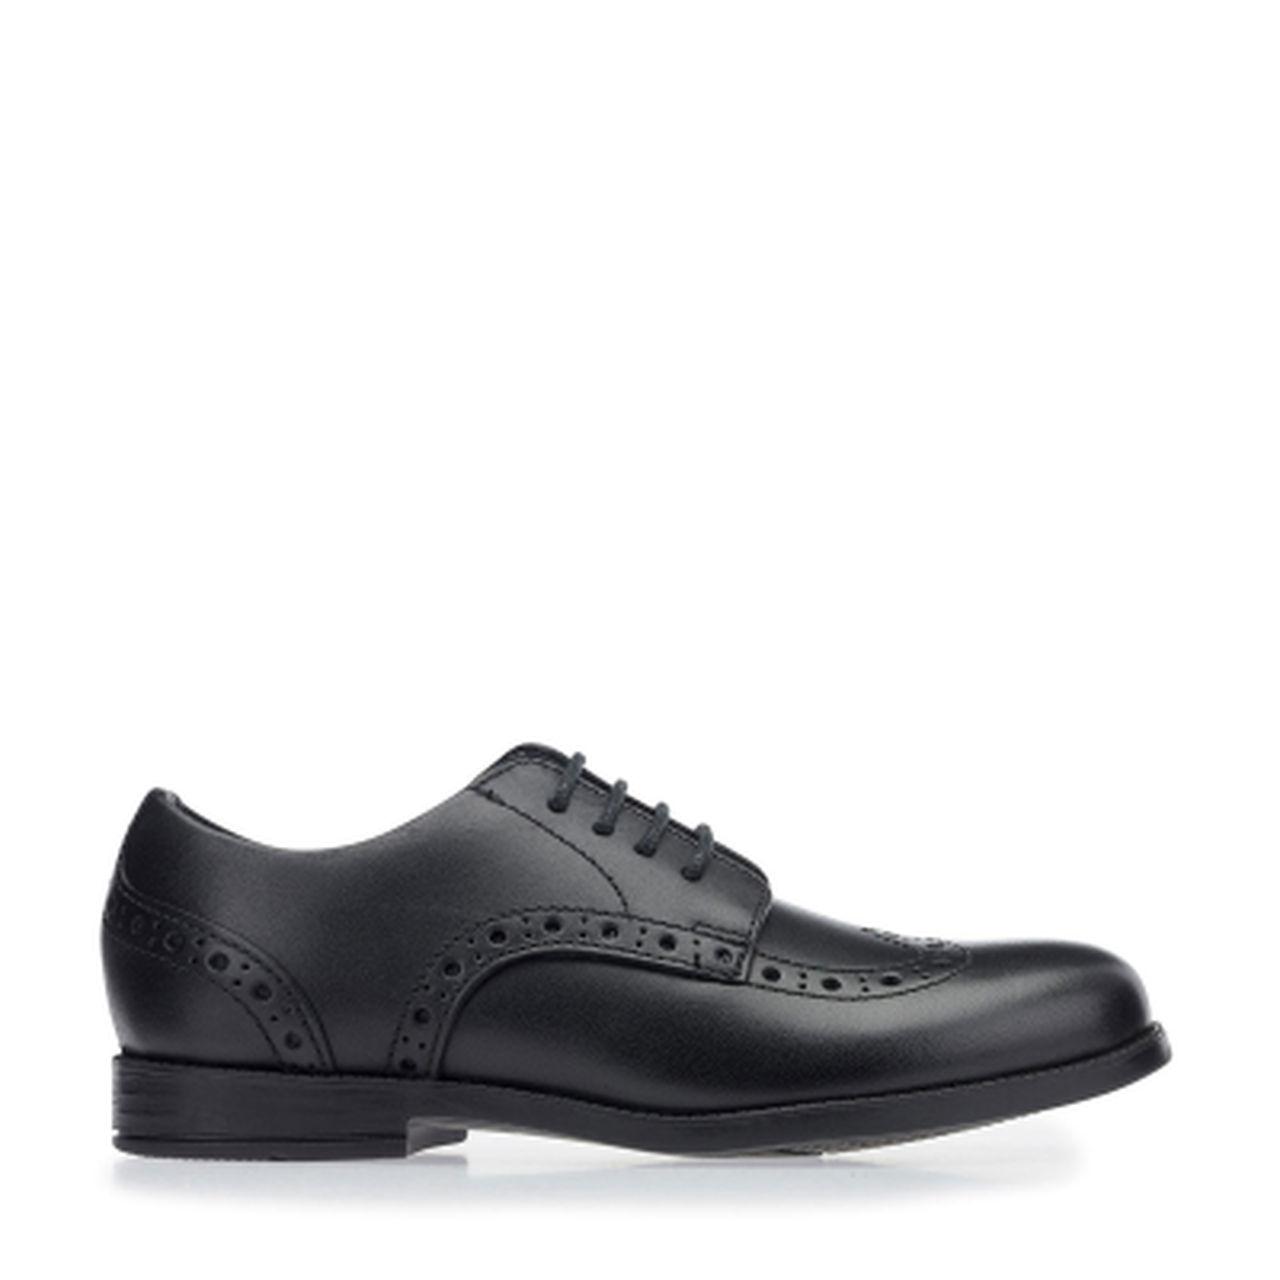 start-rite brogue pri black leather